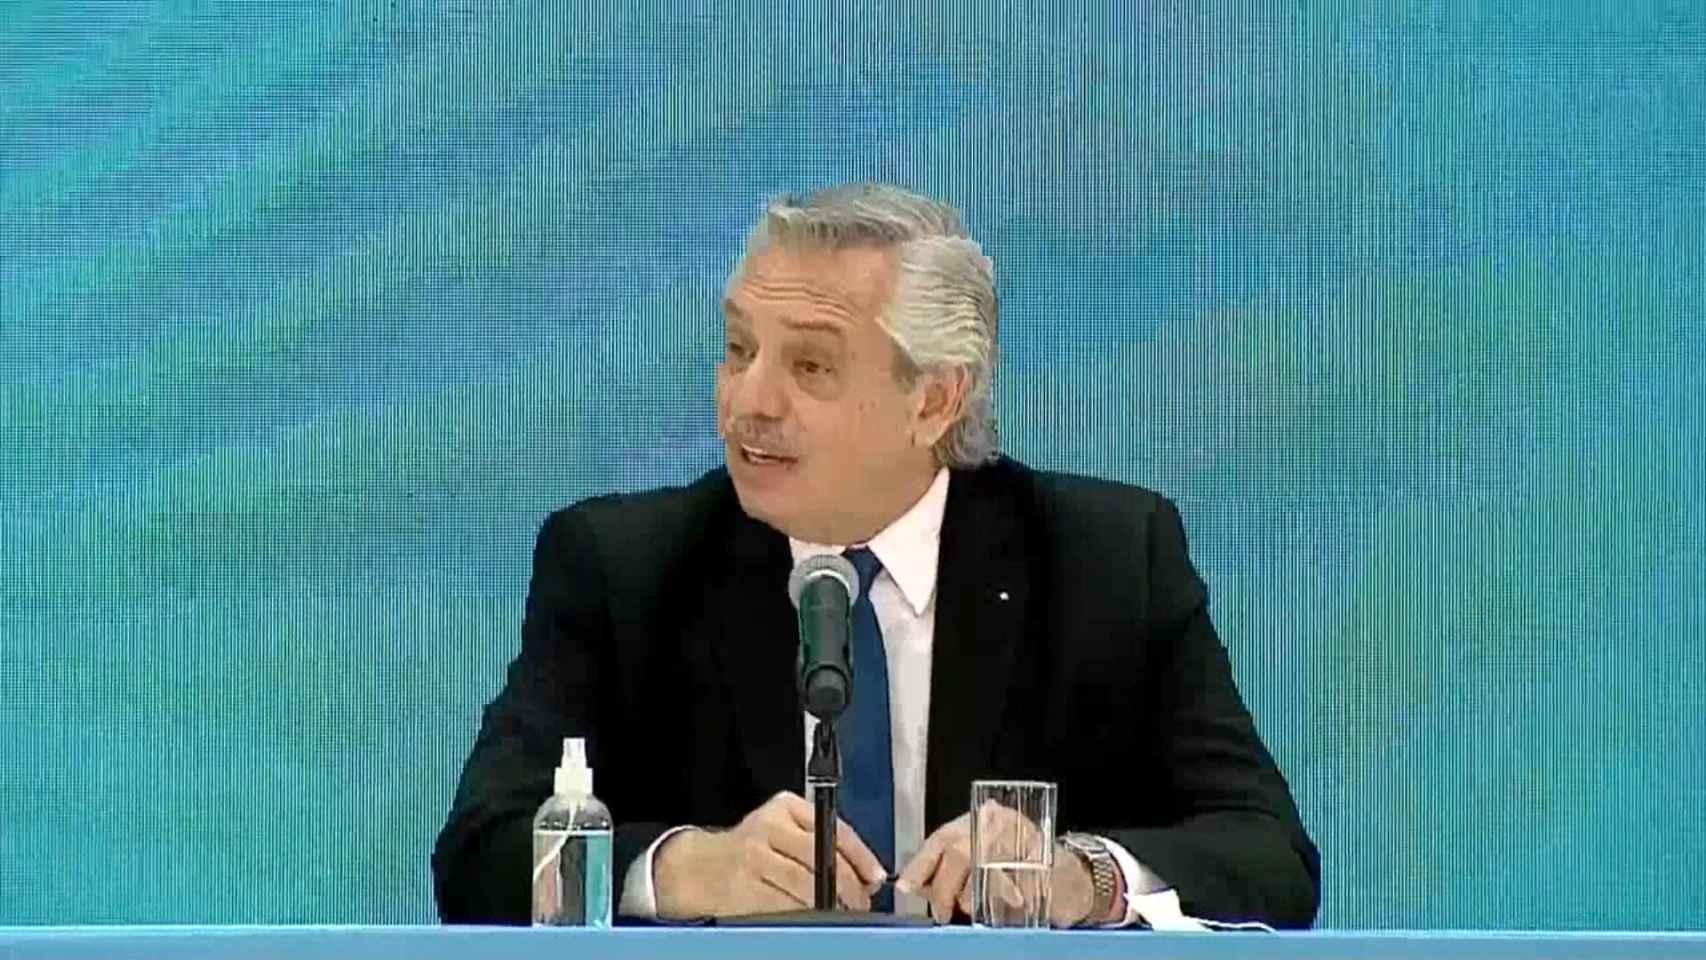 Alberto Fernández enfurece a México con este comentario racista junto a Pedro Sánchez